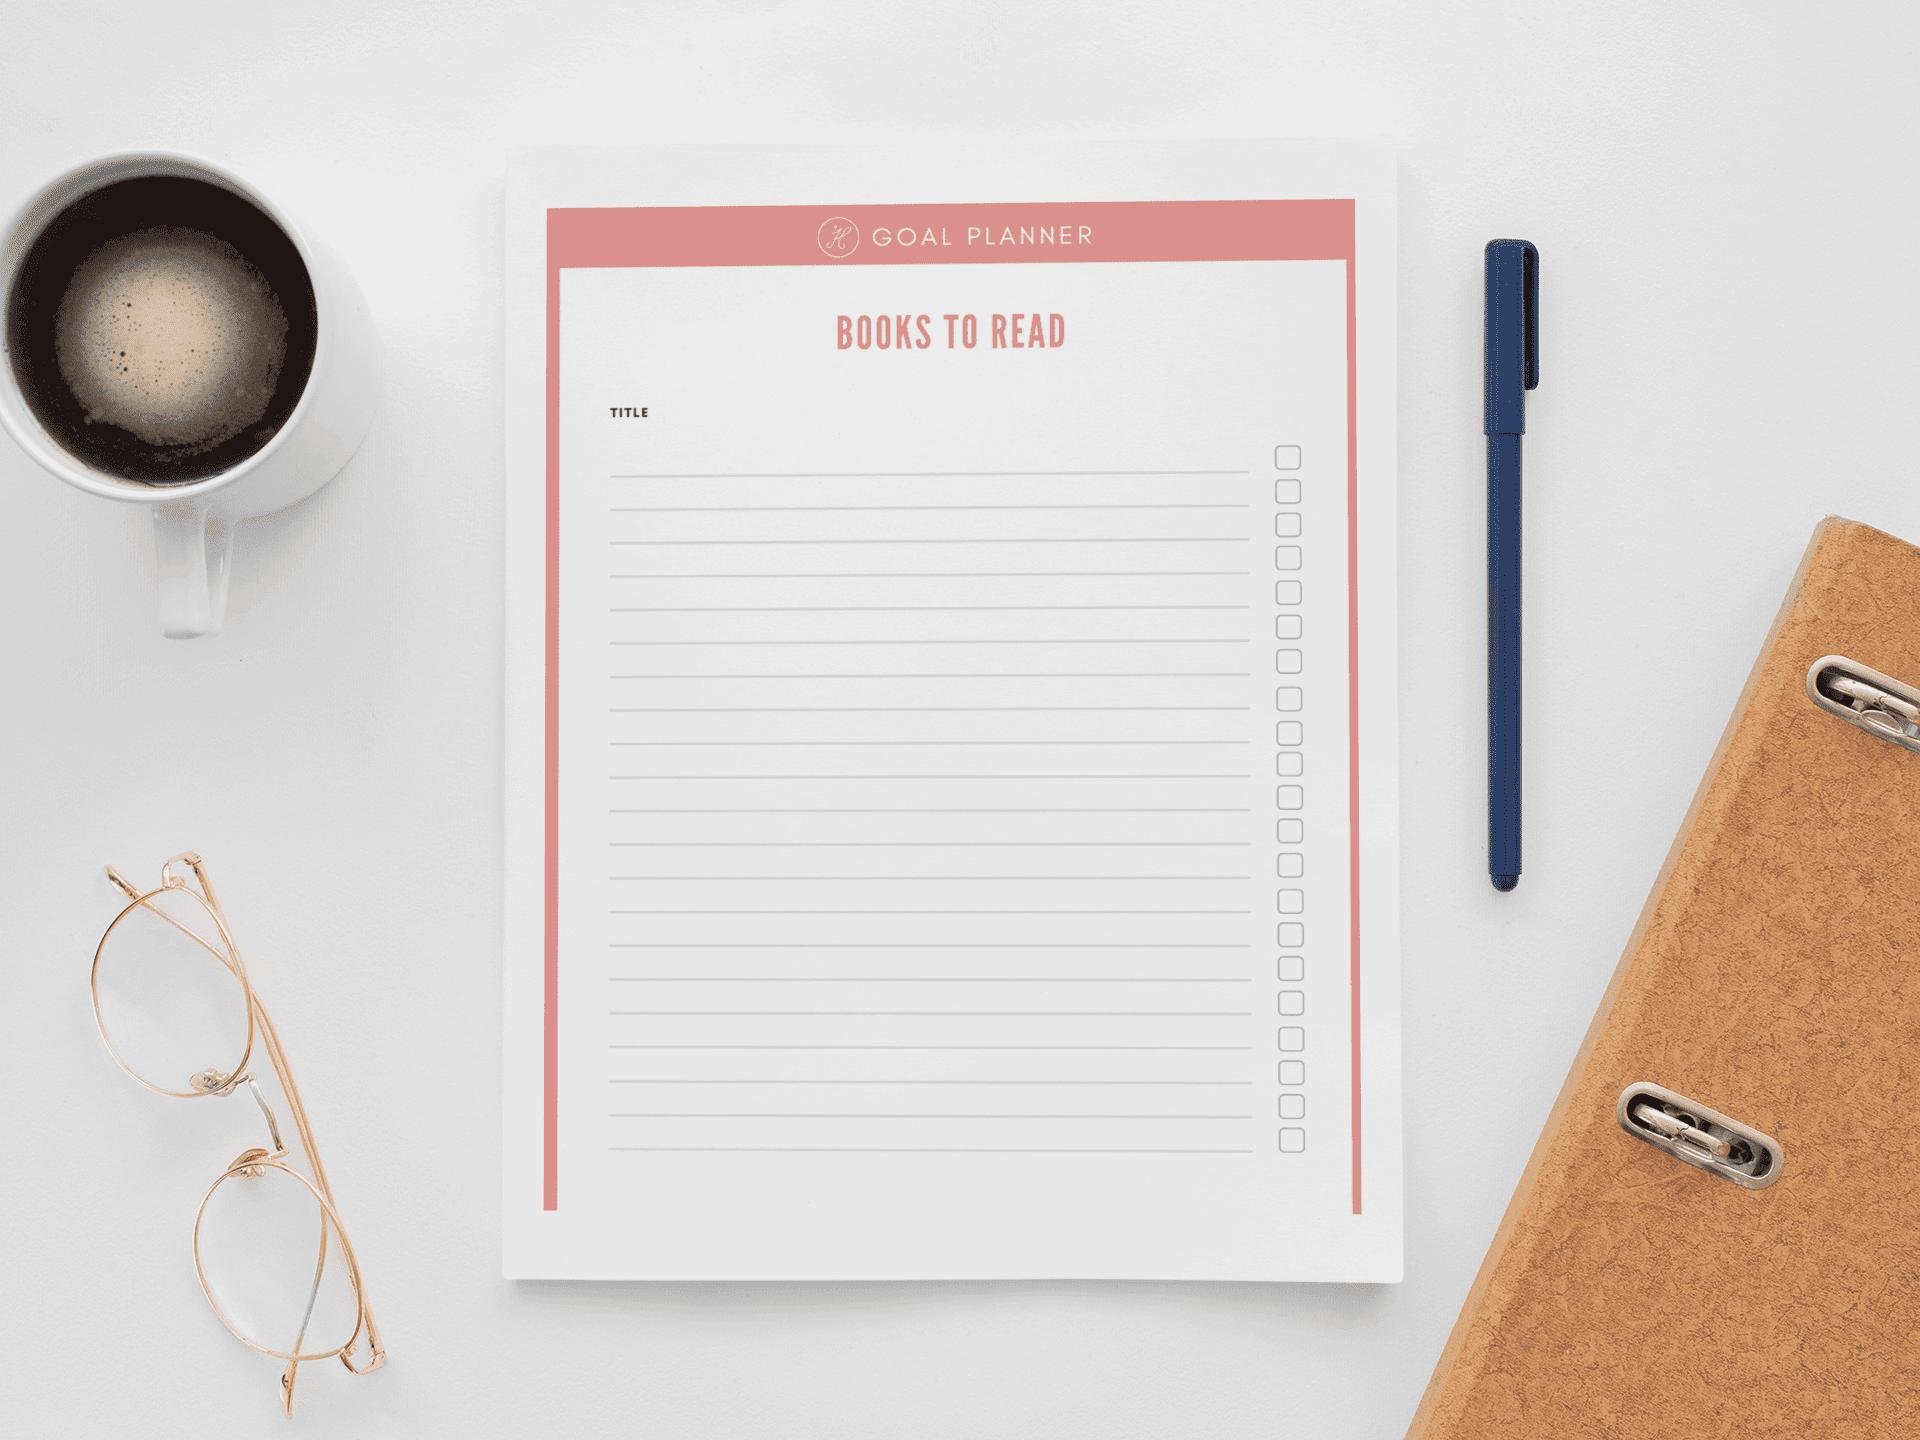 Goal Planner books to read checklist